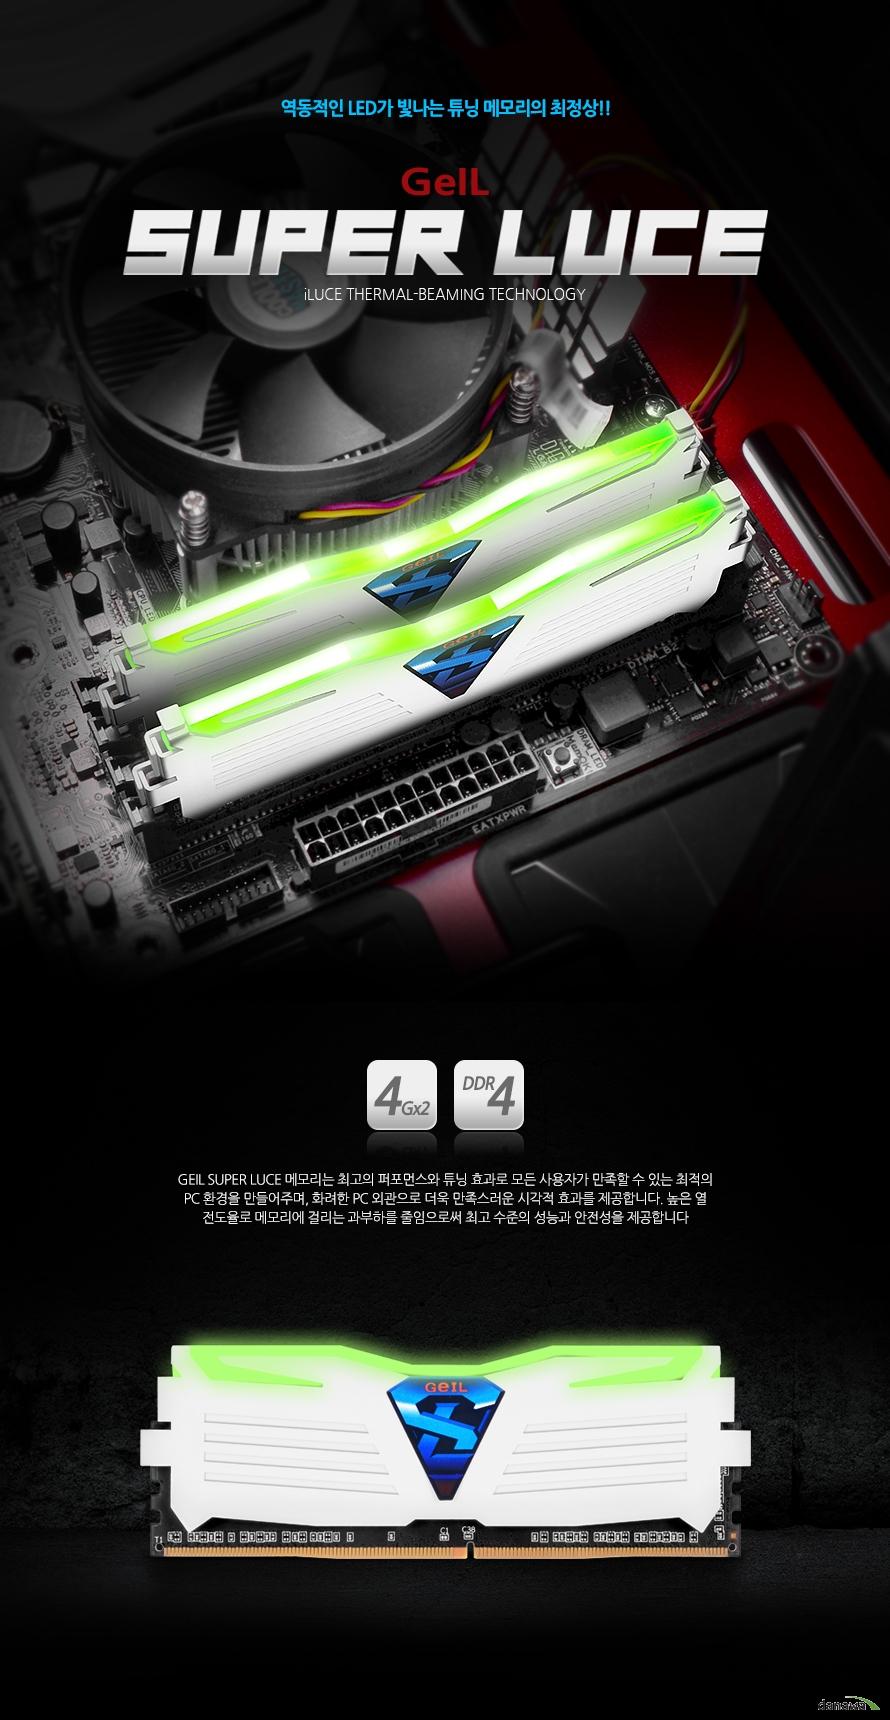 GeIL DDR4 8G PC4-19200 CL15 SUPER LUCE WHITE 그린 GEIL SUPER LUCE 메모리는 최고의 퍼포먼스와 튜닝 효과로 모든 사용자가 만족할 수 있는 최적의 PC 환경을 만들어주며, 화려한 PC 외관으로 더욱 만족스러운 시각적 효과를 제공합니다. 높은 열 전도율로 메모리에 걸리는 과부하를 줄임으로써 최고 수준의 성능과 안전성을 제공합니다